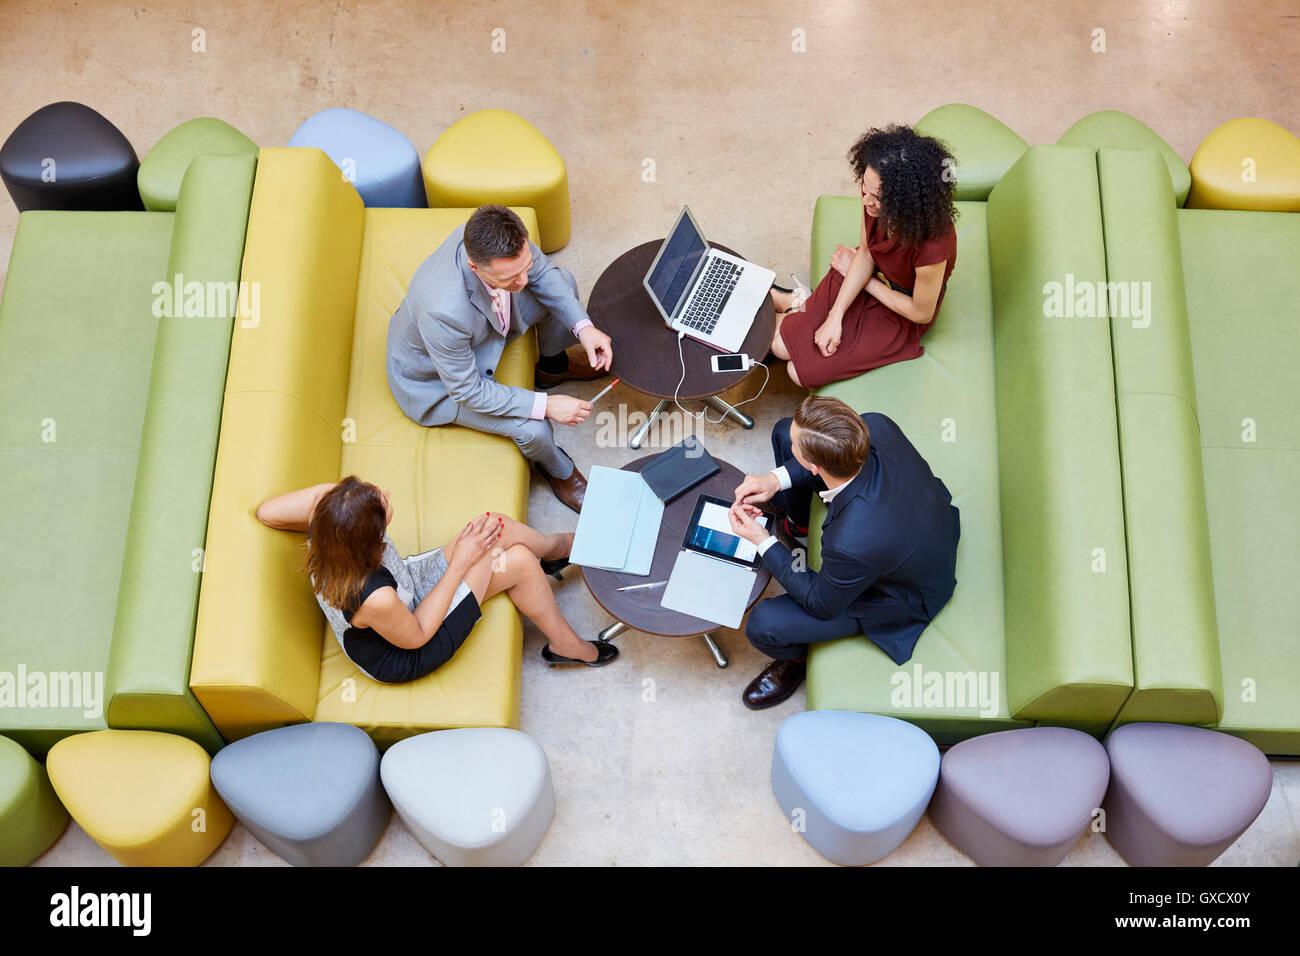 Overhead view of businessmen and businesswomen meeting on design studio sofas - Stock Image